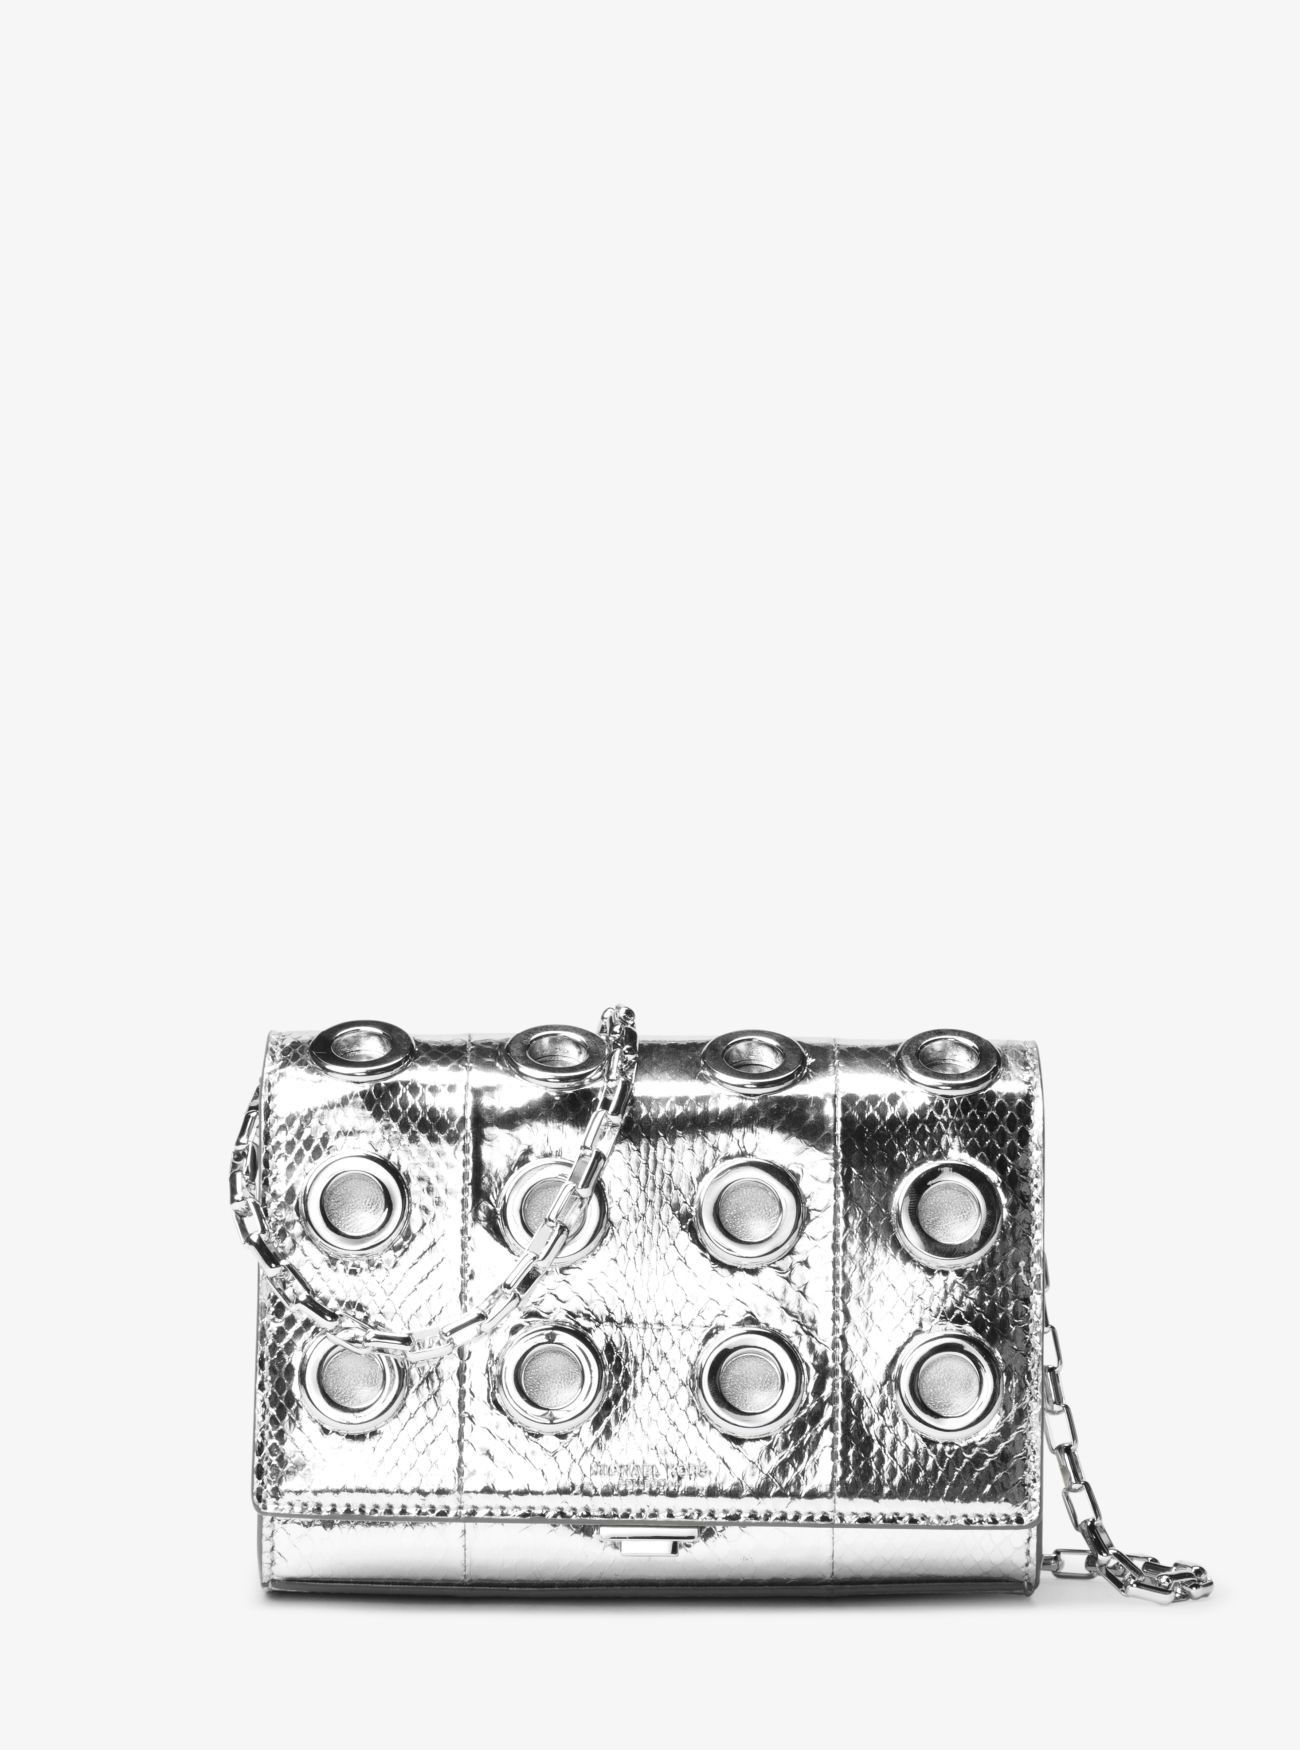 8e1ef9419d78 MICHAEL KORS Yasmeen Small Grommeted Metallic Snakeskin Clutch.  michaelkors   bags  clutch  metallic  shoulder bags  suede  lining  hand bags